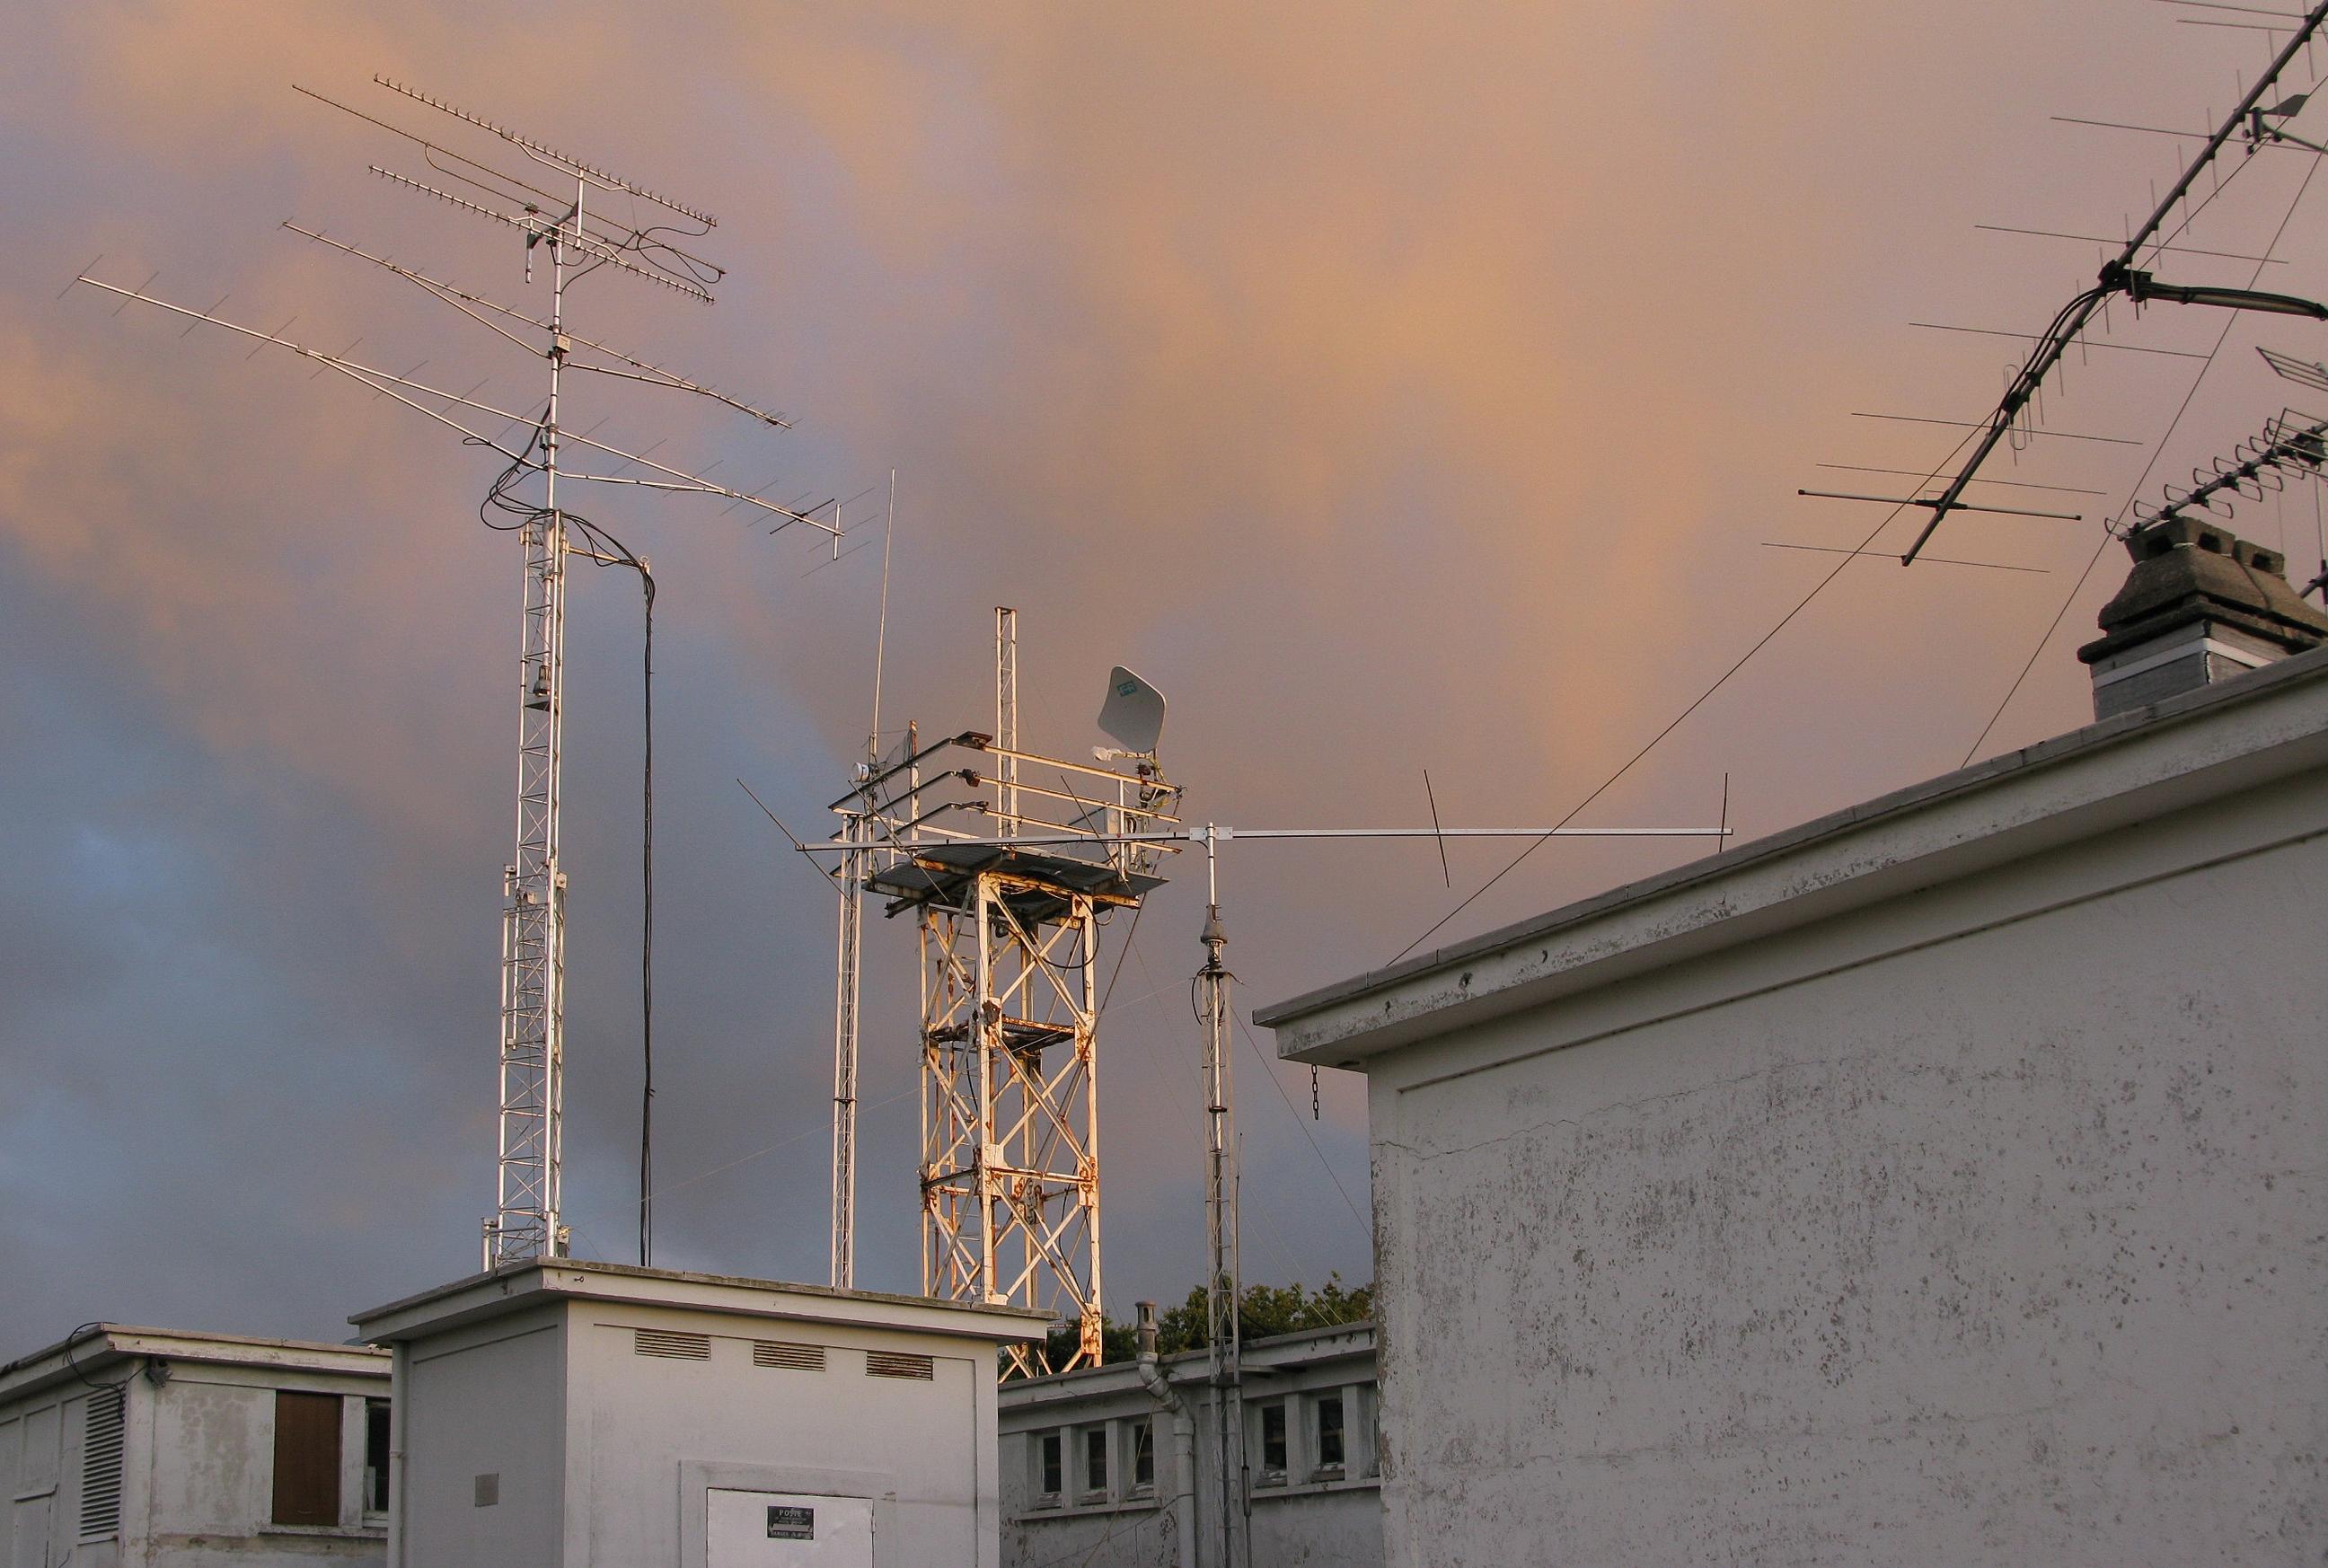 FichierRadioamateur   Antenna Farm.jpg — Wikipédia